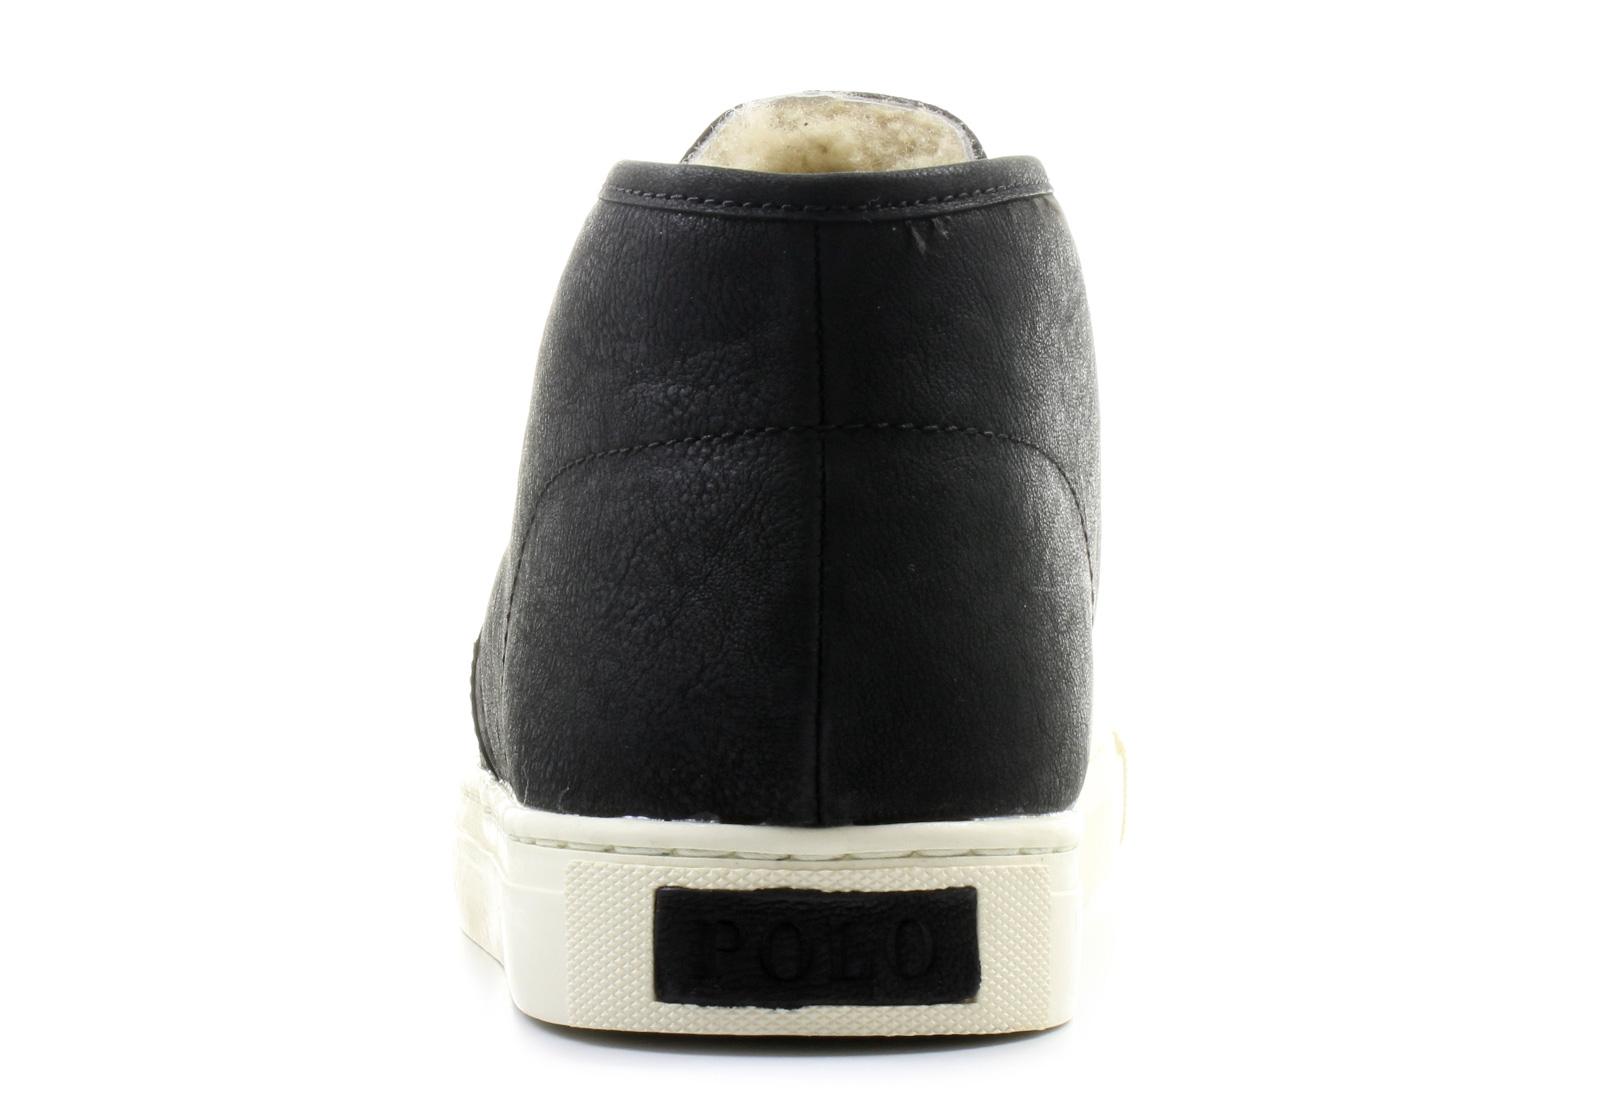 Polo Ralph Lauren Topánky - Joplin S - 0461-R-A0517 - Tenisky ... c331df20d8a